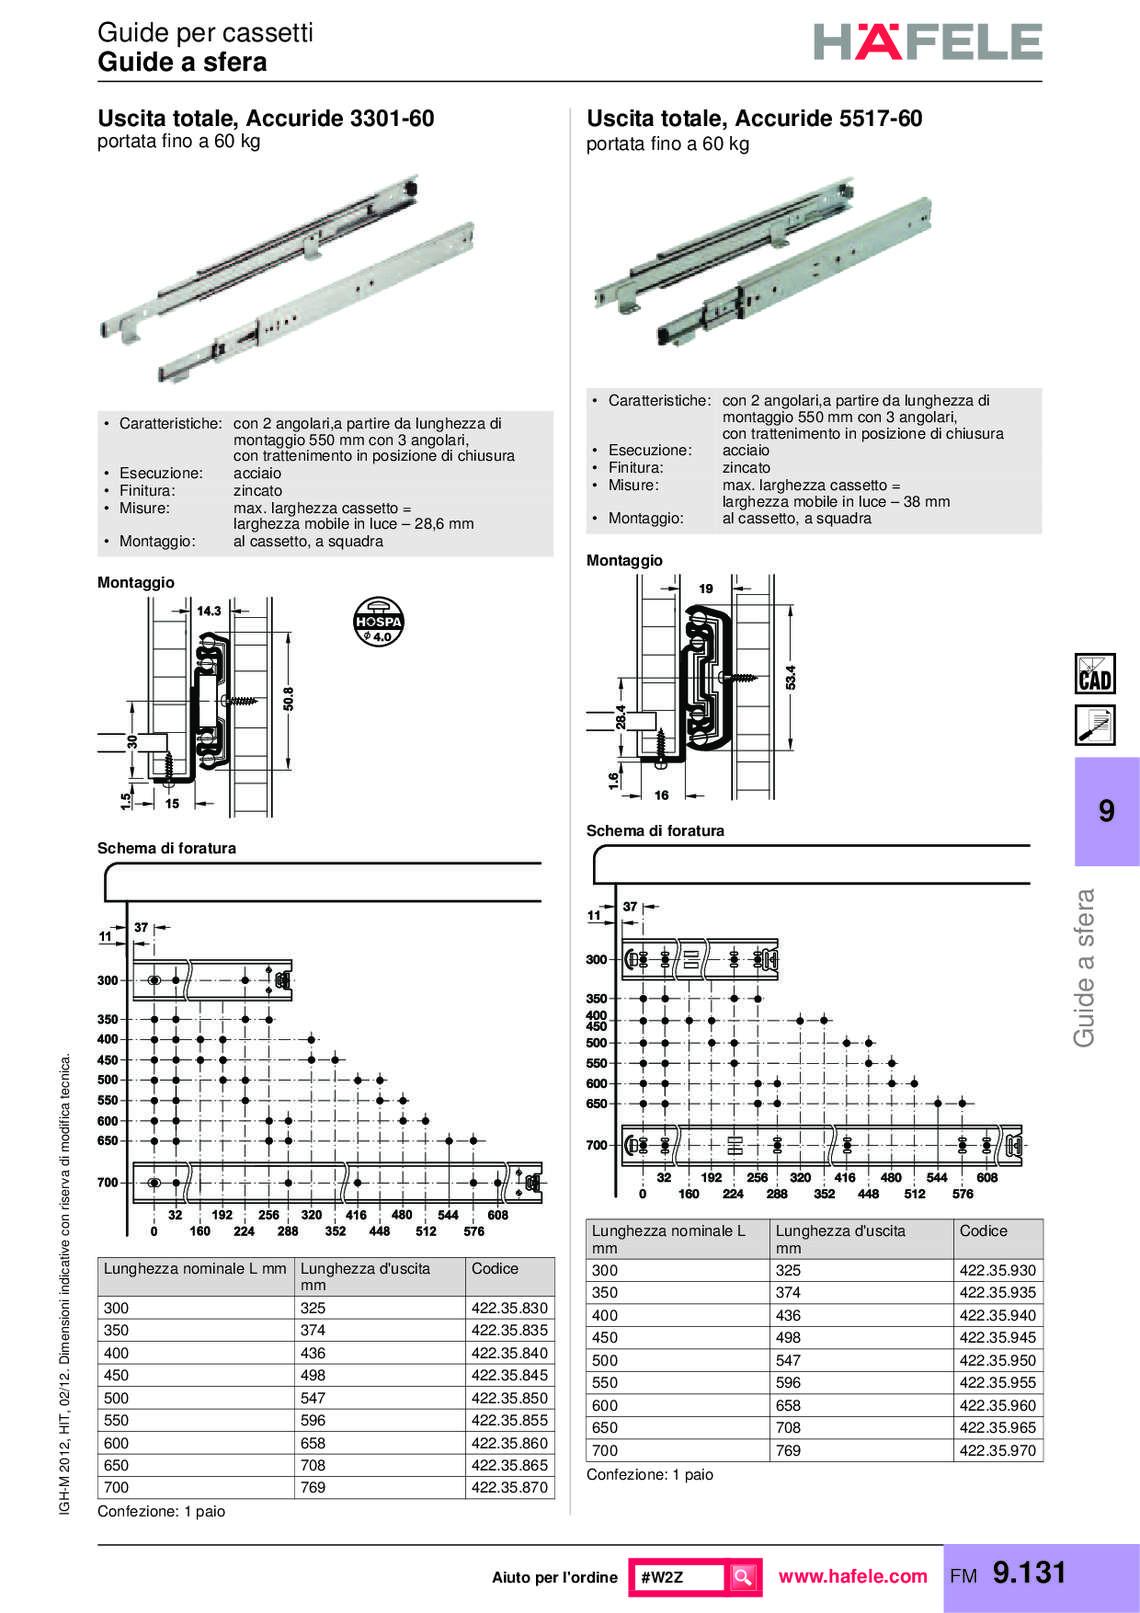 hafele-spondine-e-guide-per-mobili_40_184.jpg